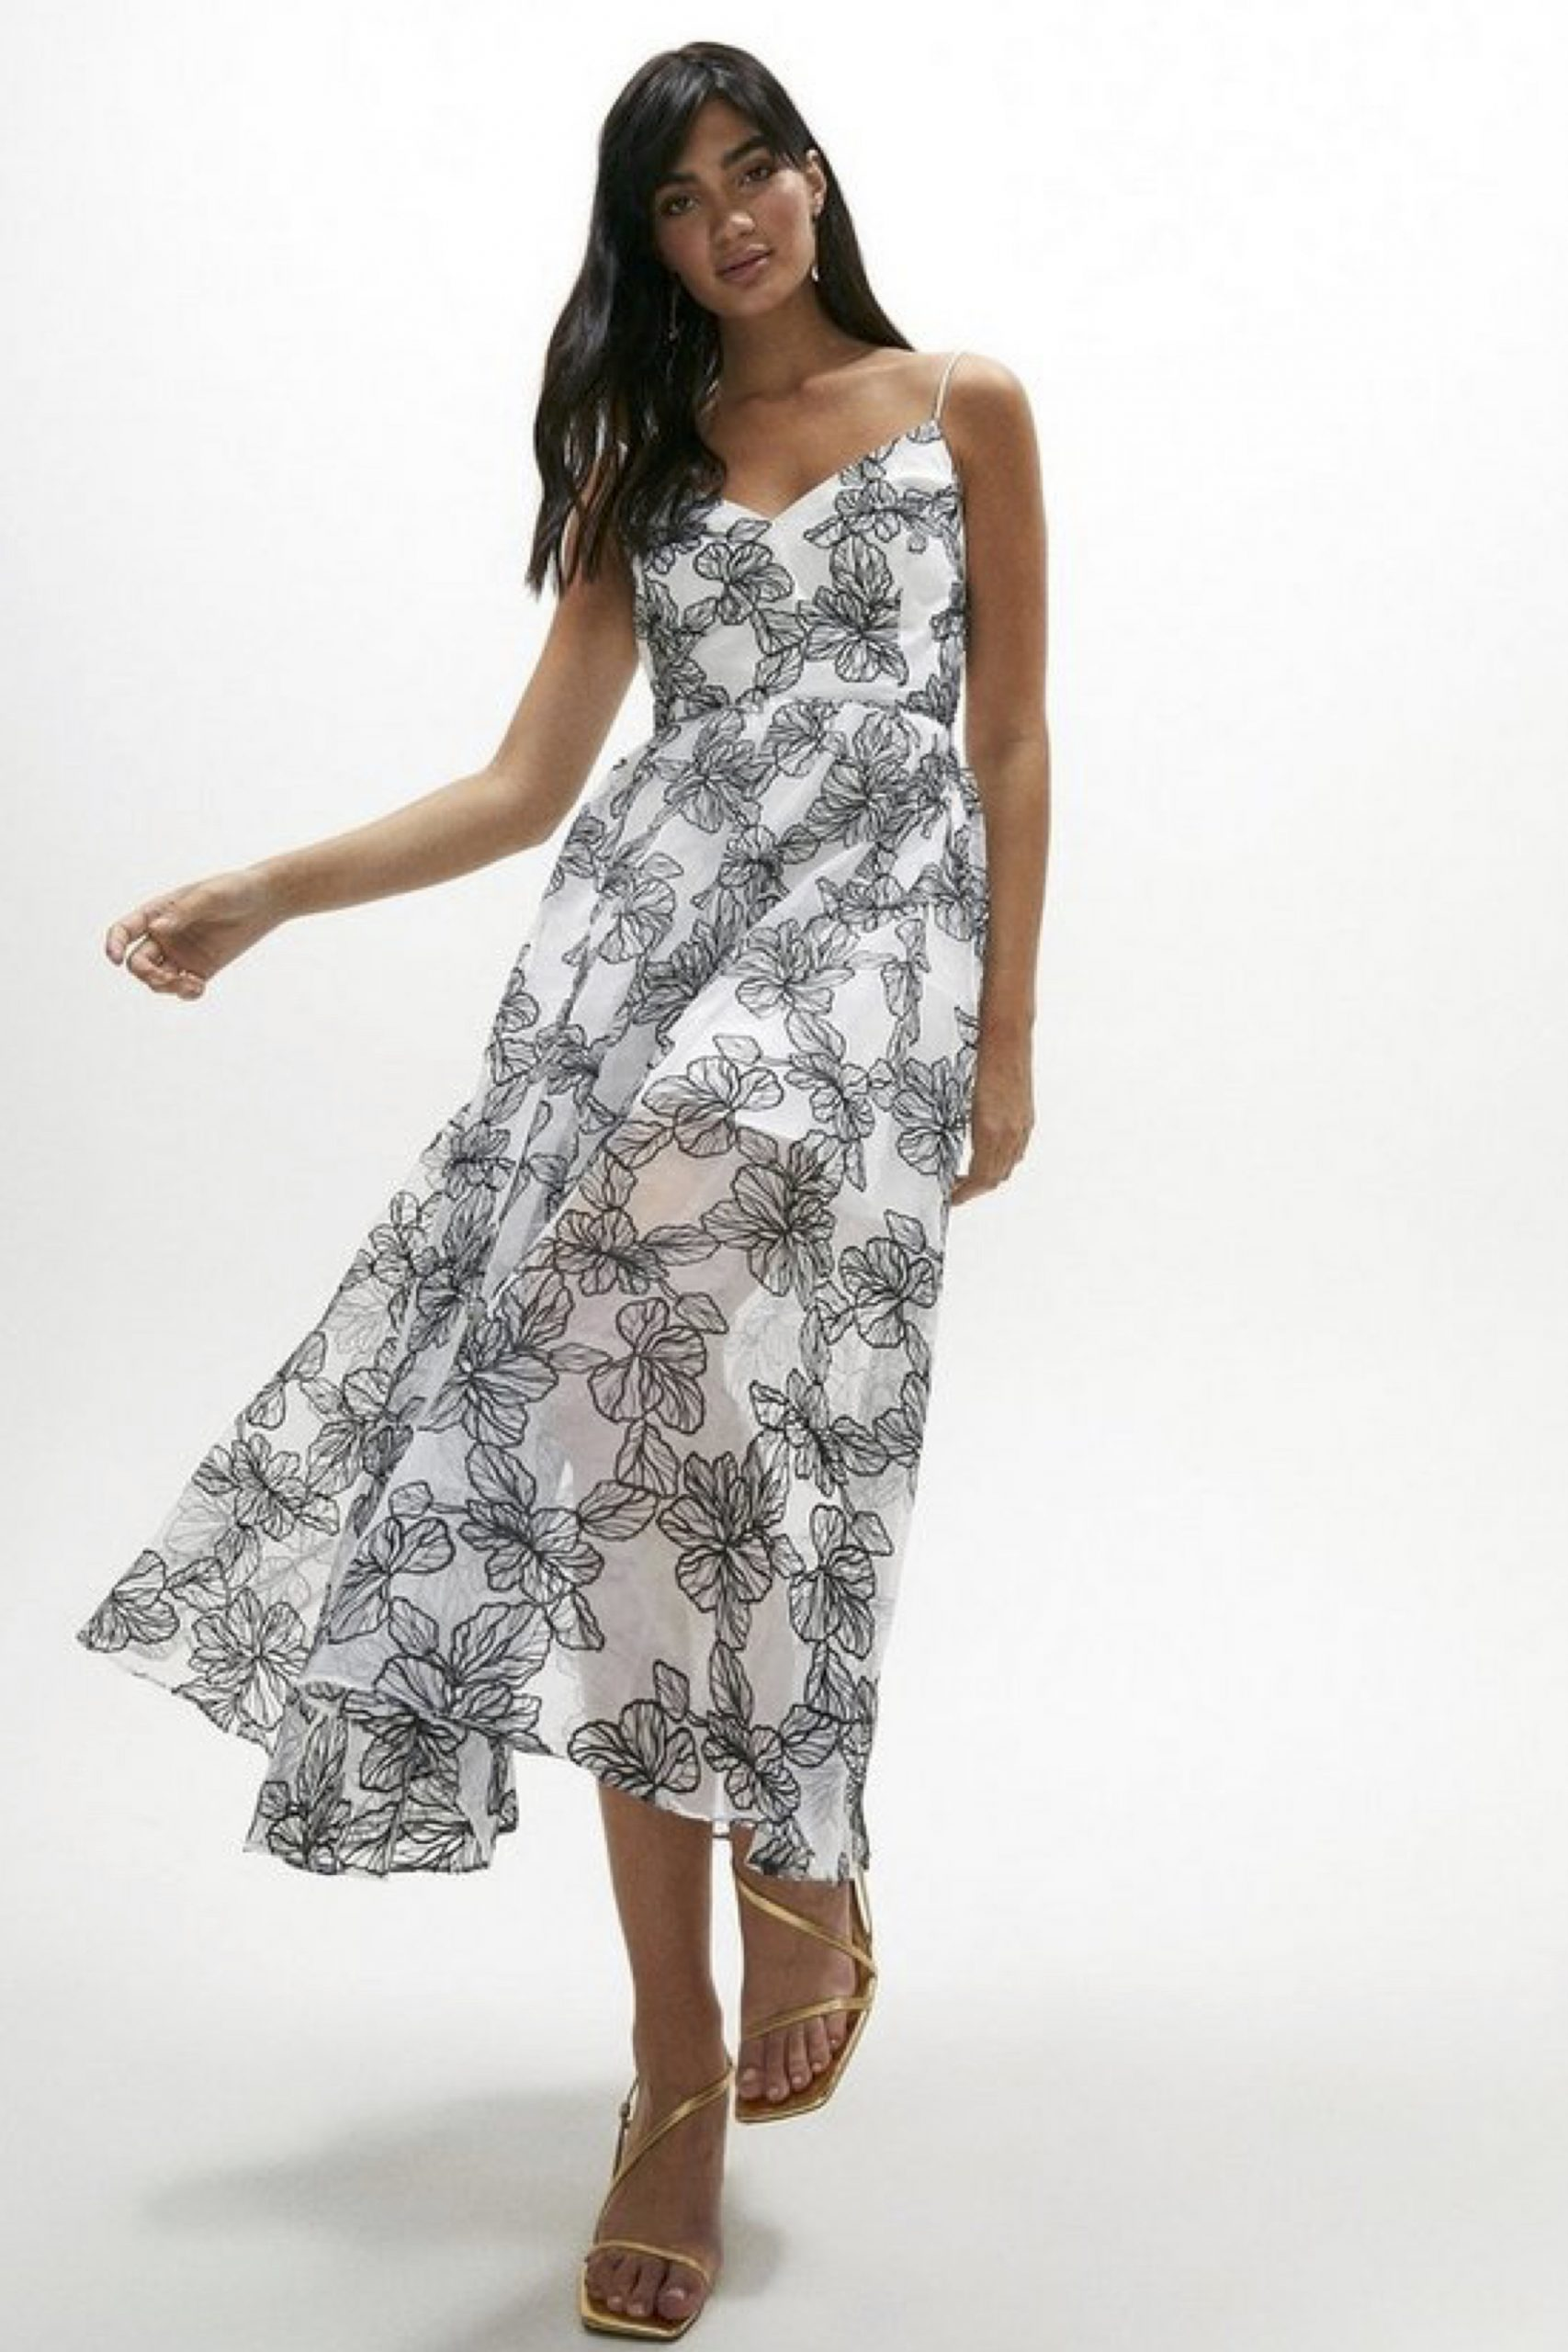 Fleur Embroidered Organza Midi Dress, was £149 > now £111.75